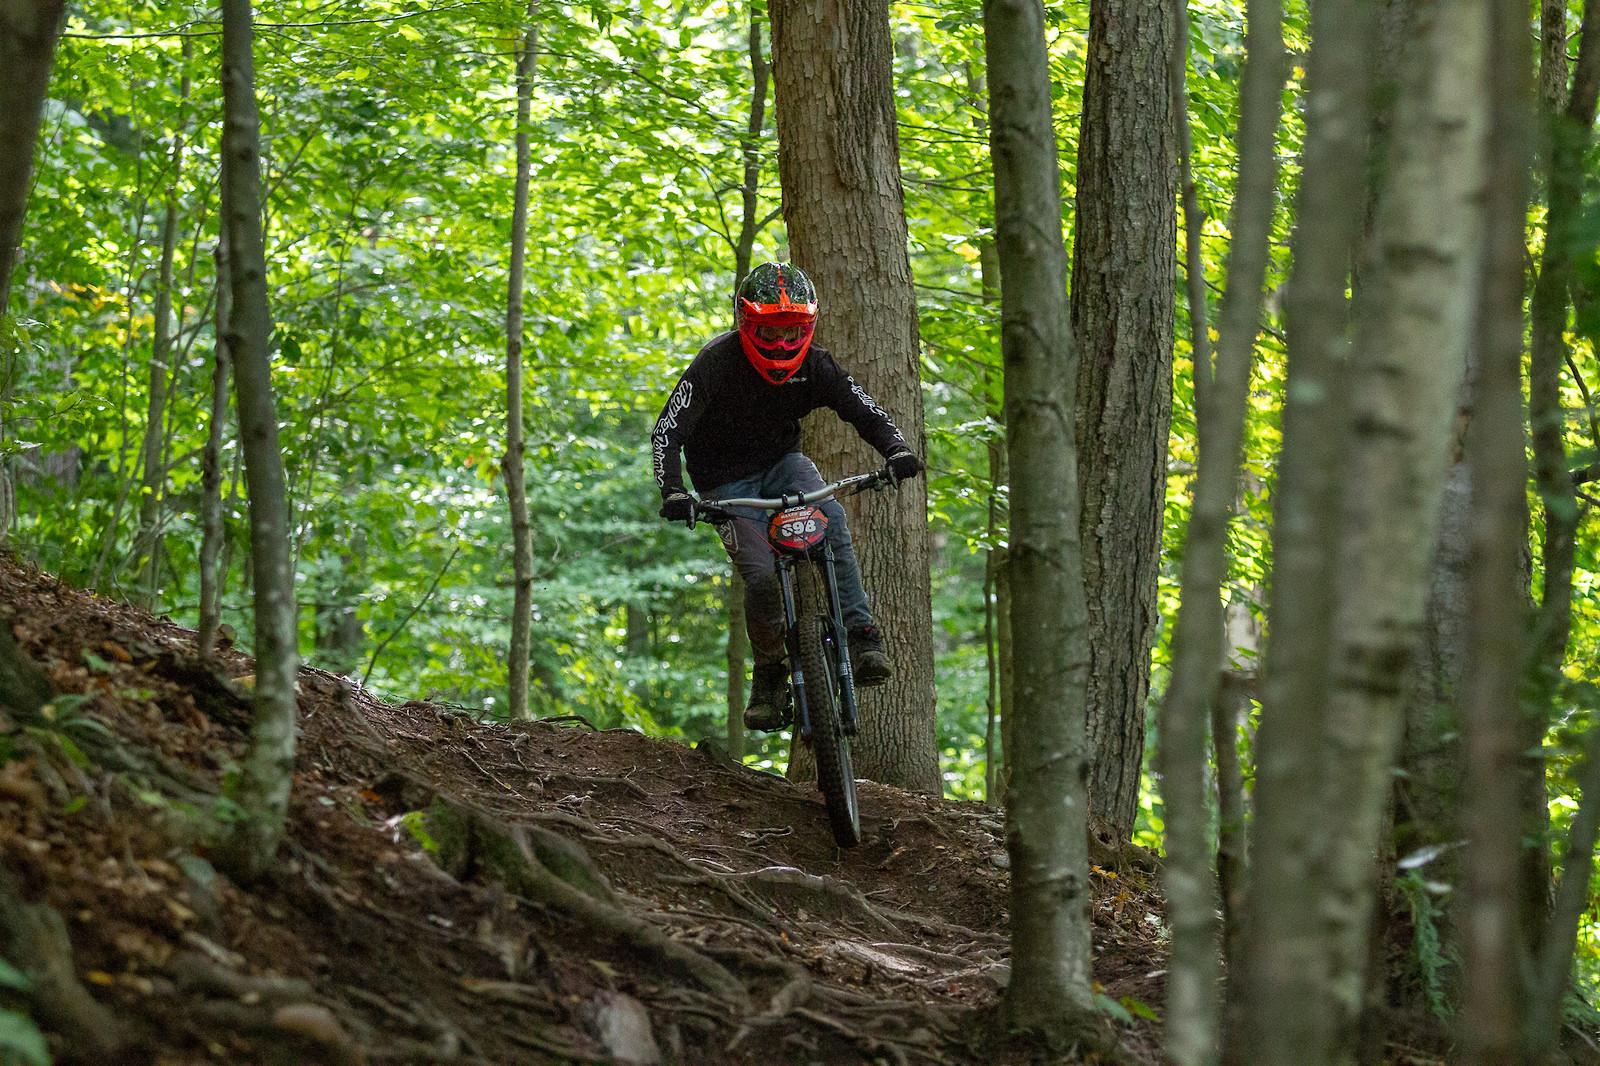 Jordan Miller - JackRice - Mountain Biking Pictures - Vital MTB